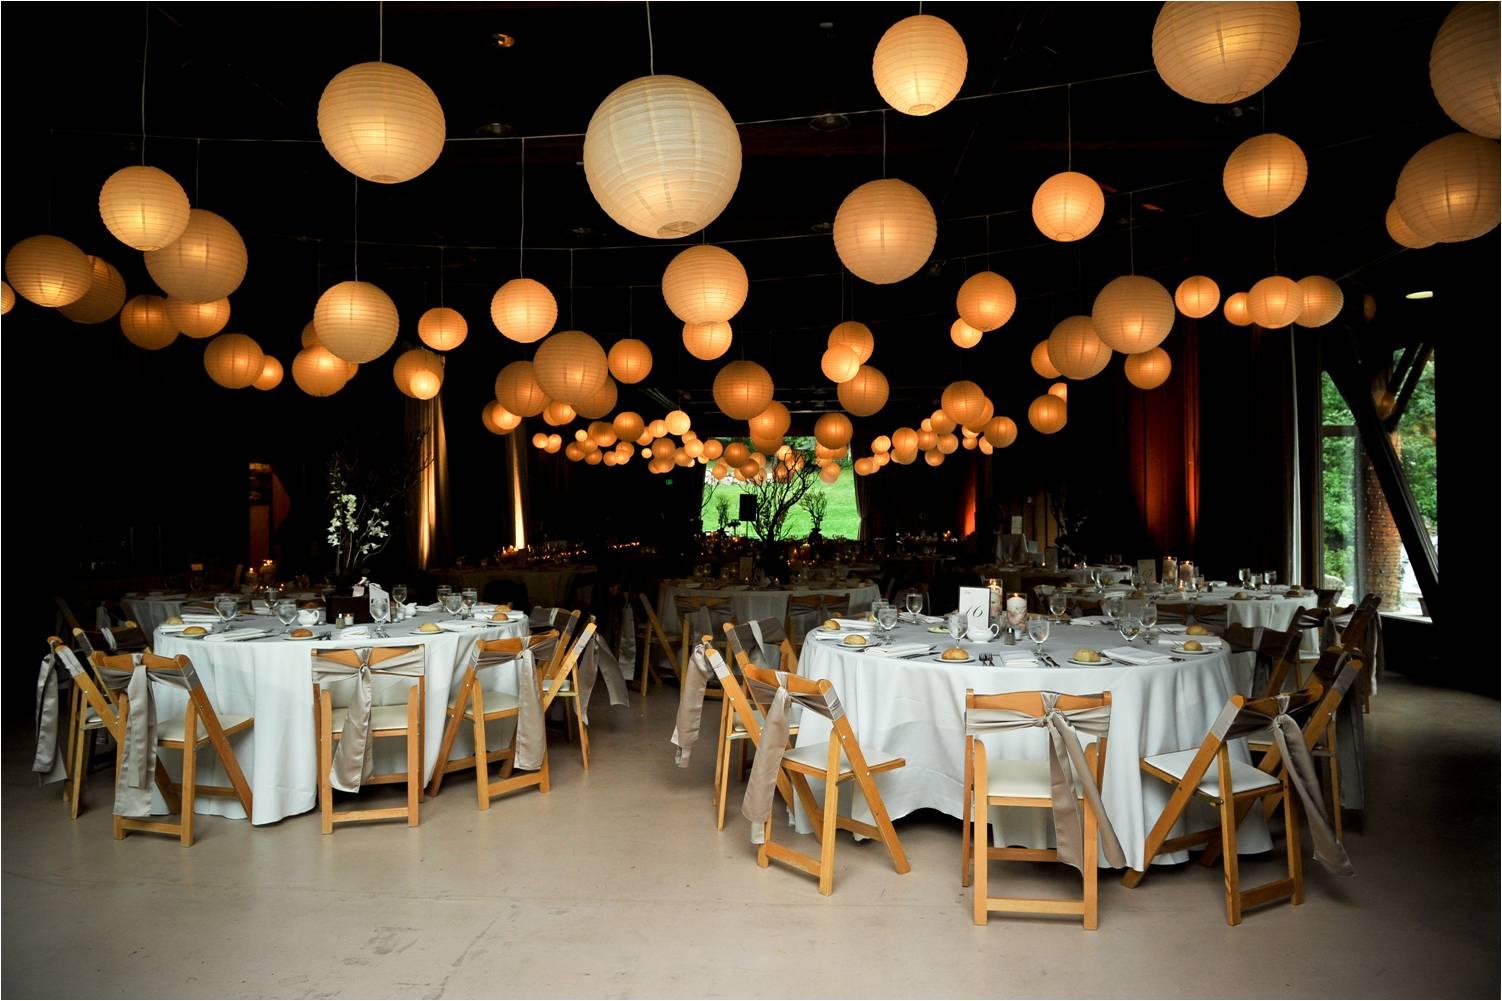 wedding venue decor idea lighting loans wedding how to plan a wedding. Black Bedroom Furniture Sets. Home Design Ideas